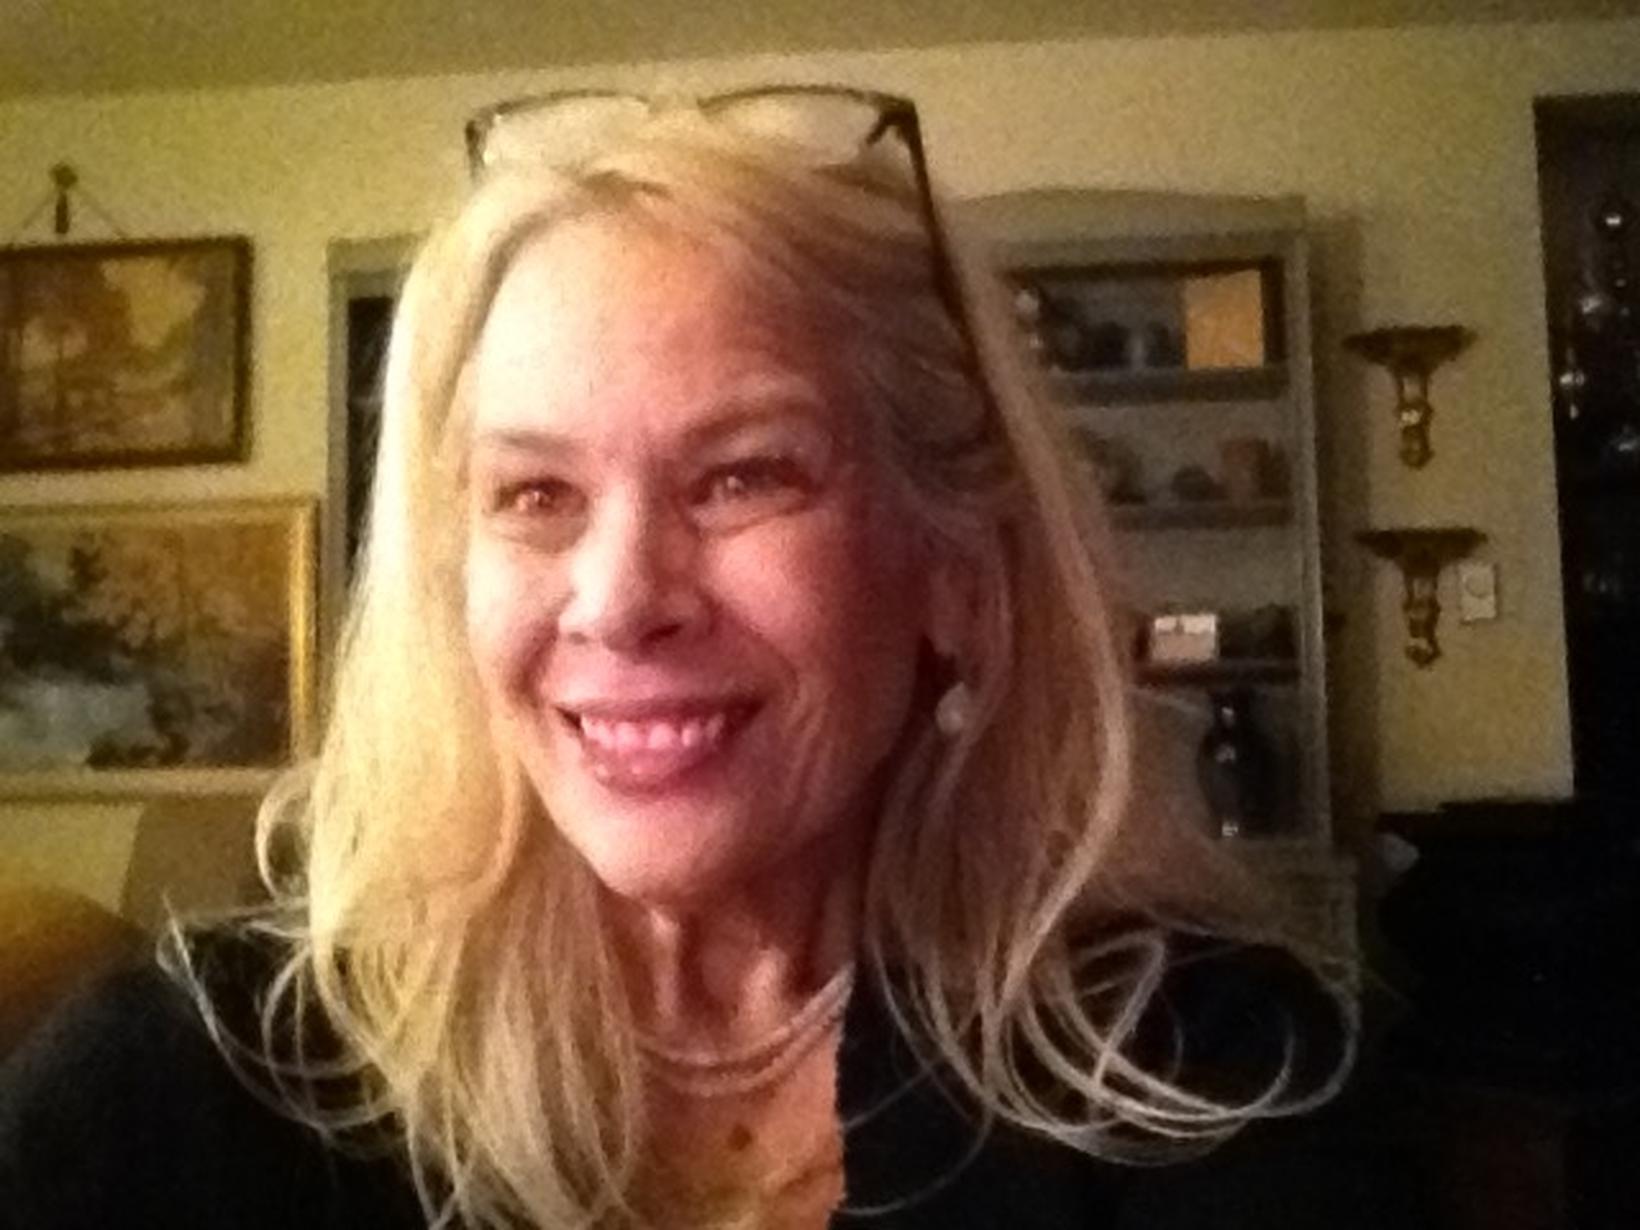 Sally from Kalamazoo, Michigan, United States